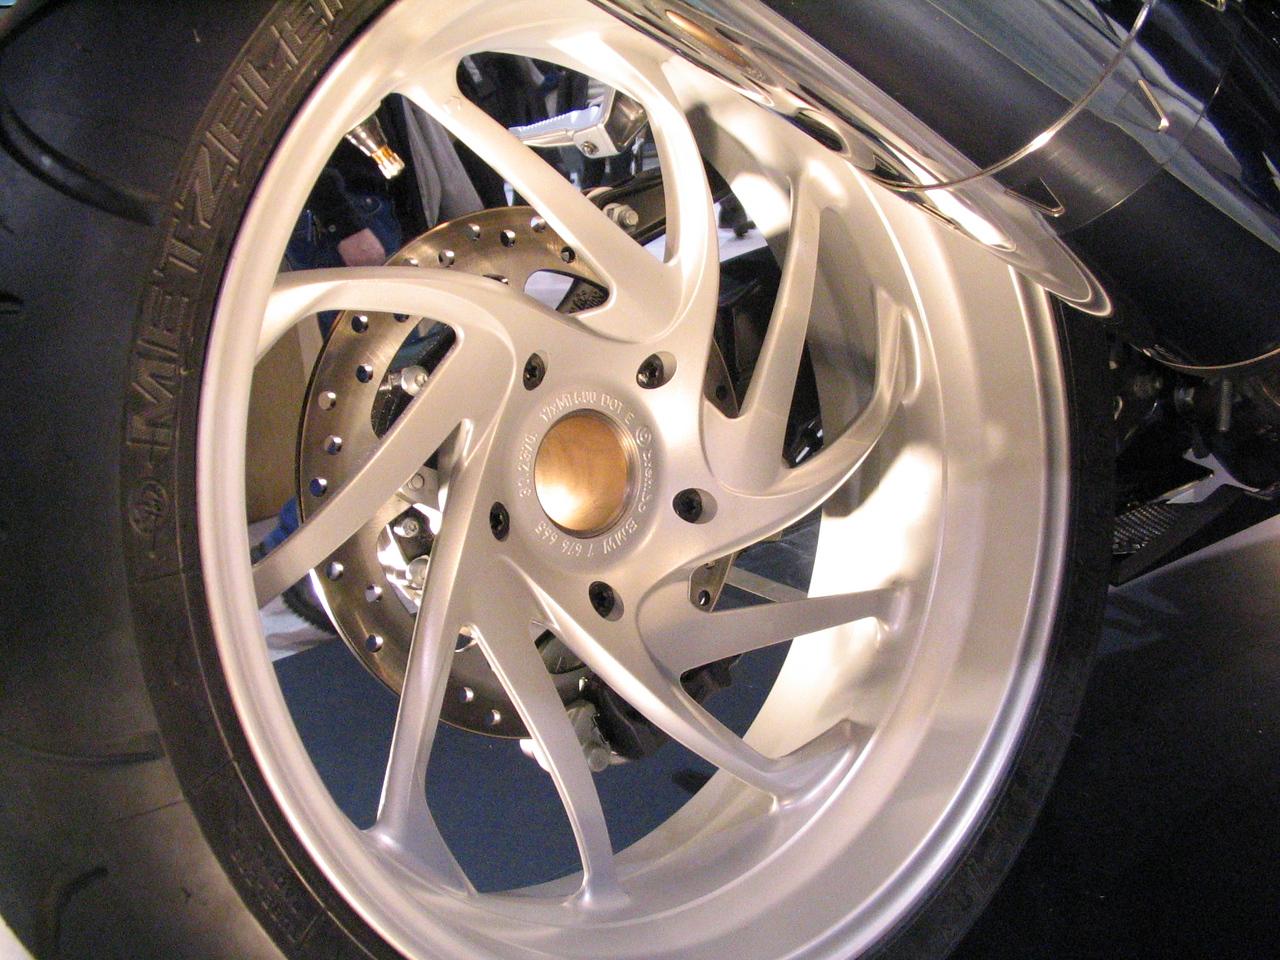 The jewel-like rear wheel of the new K1200S.